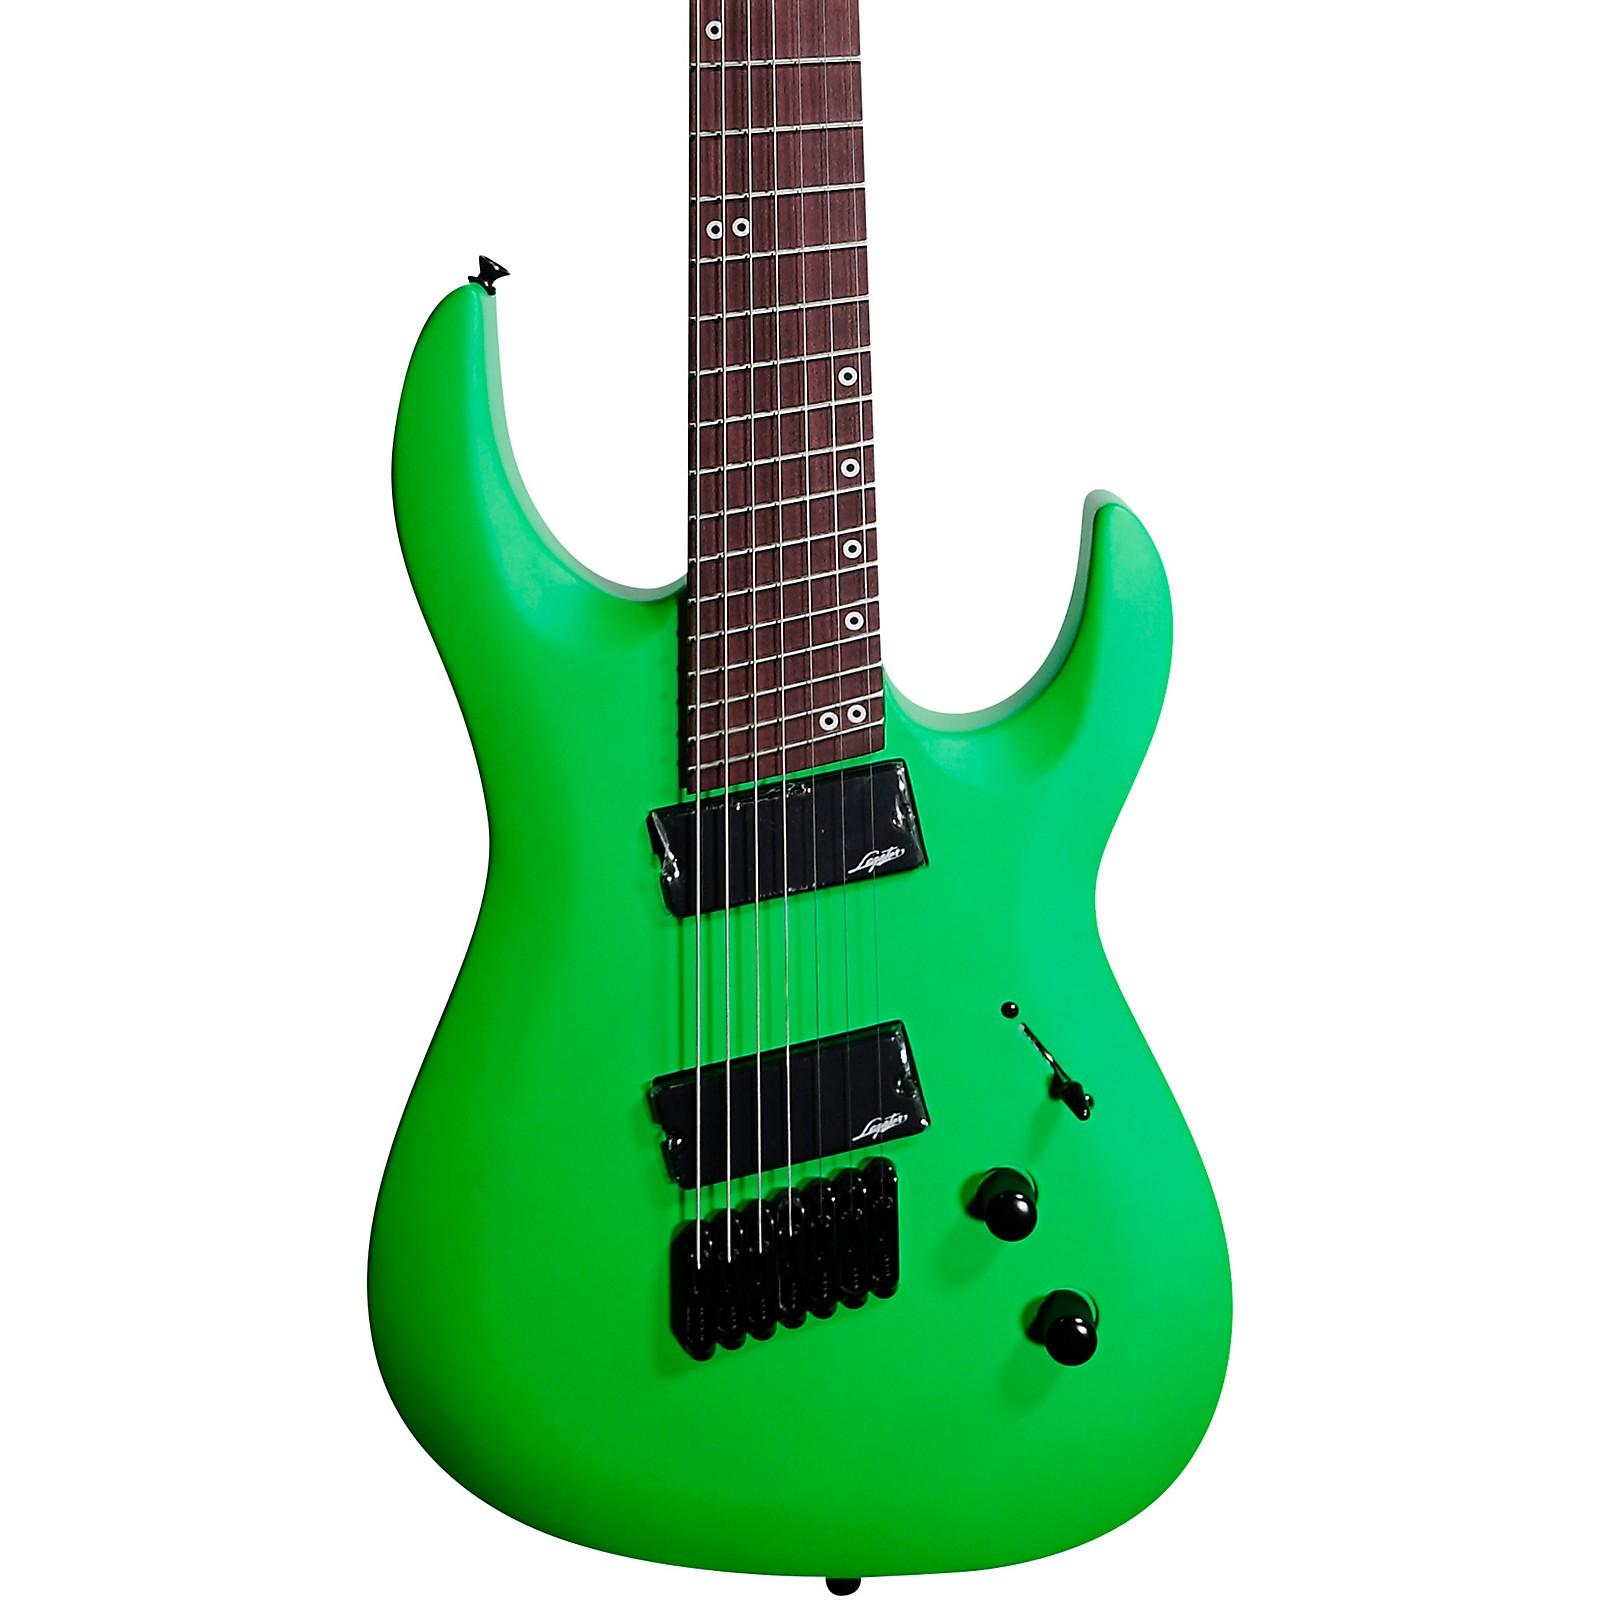 Open Box Legator Ninja R Mutli-Scale 7-String Special Electric Guitar